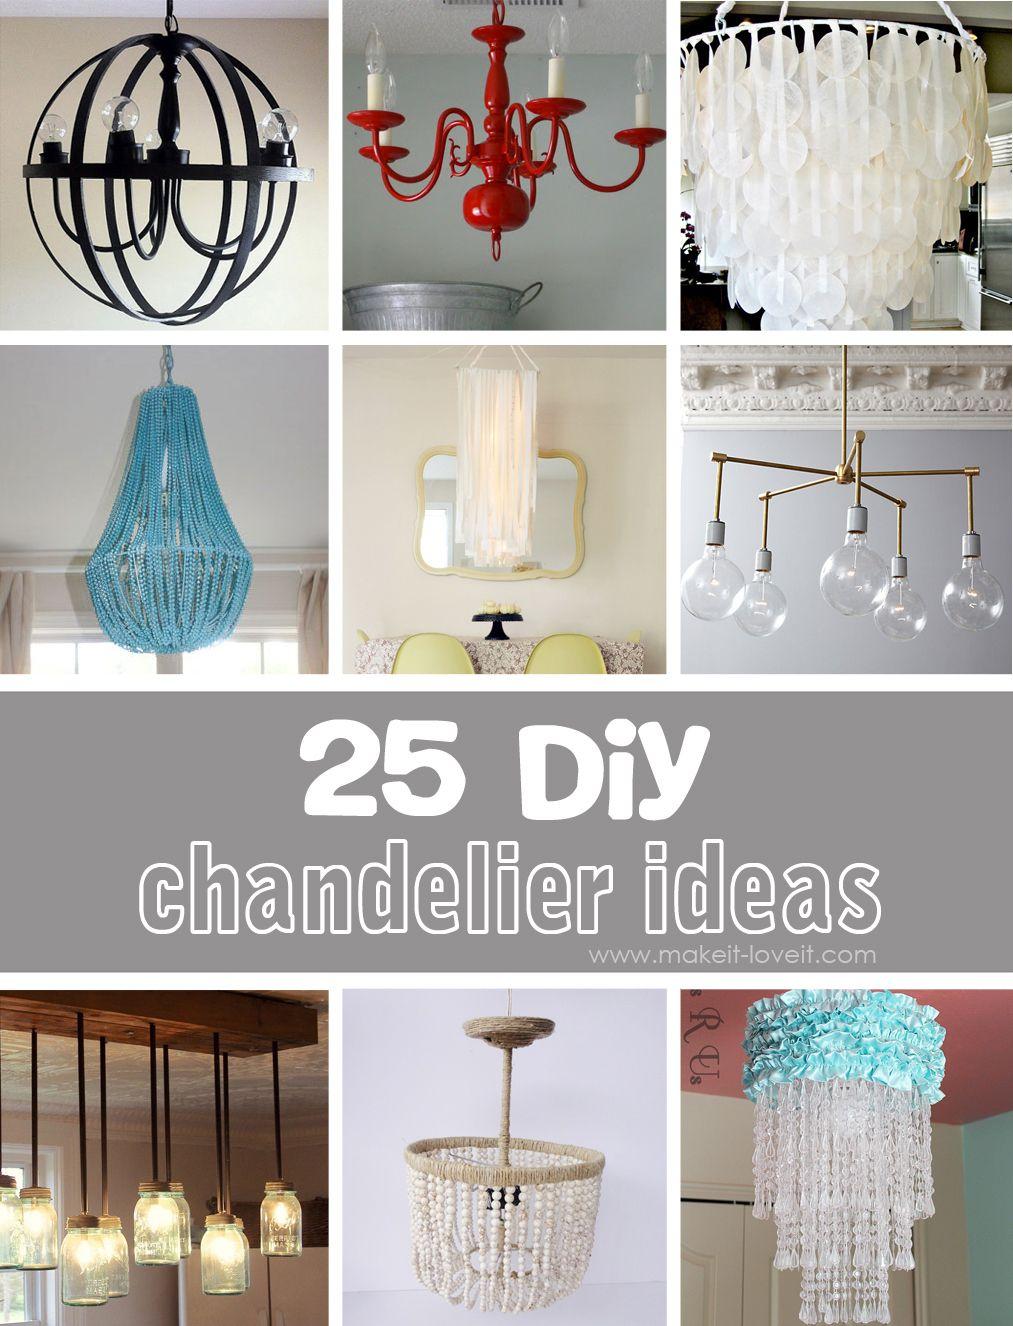 25 Diy Chandelier Ideas Diy Chandelier Homemade Chandelier Diy